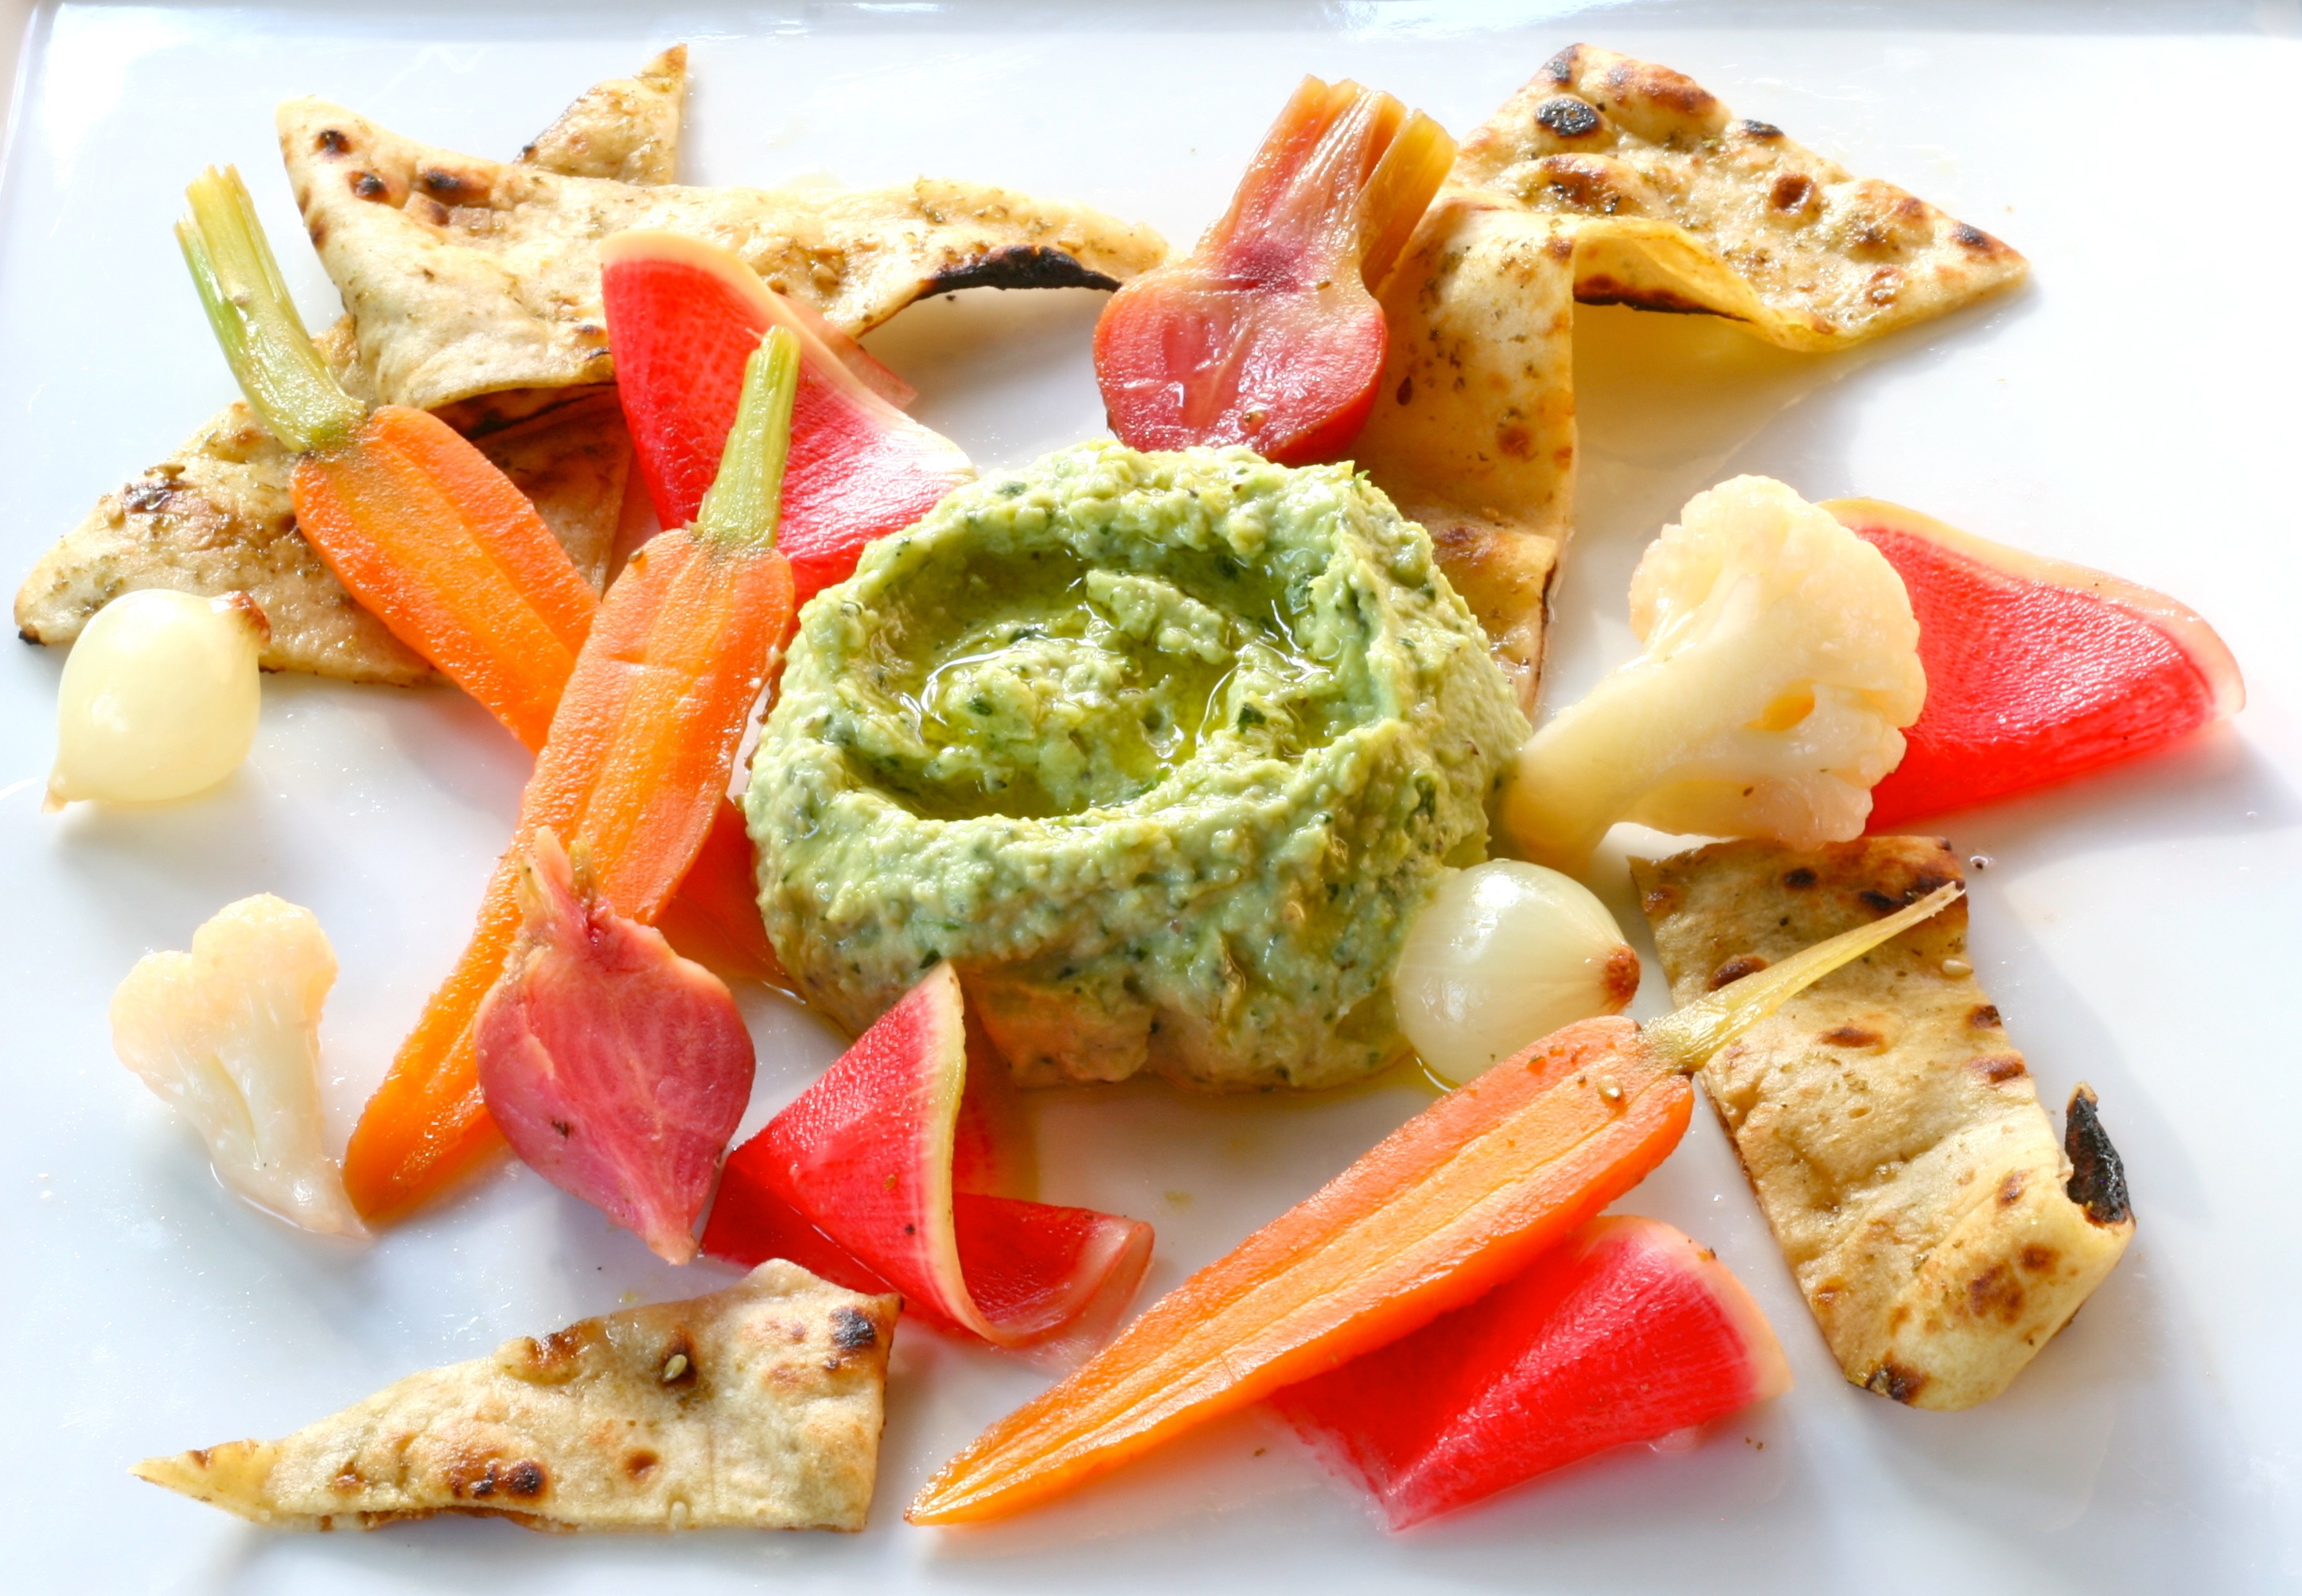 Cilantro Jalapeño Edamame Hummus & Roasted Beet Salad - Green Living